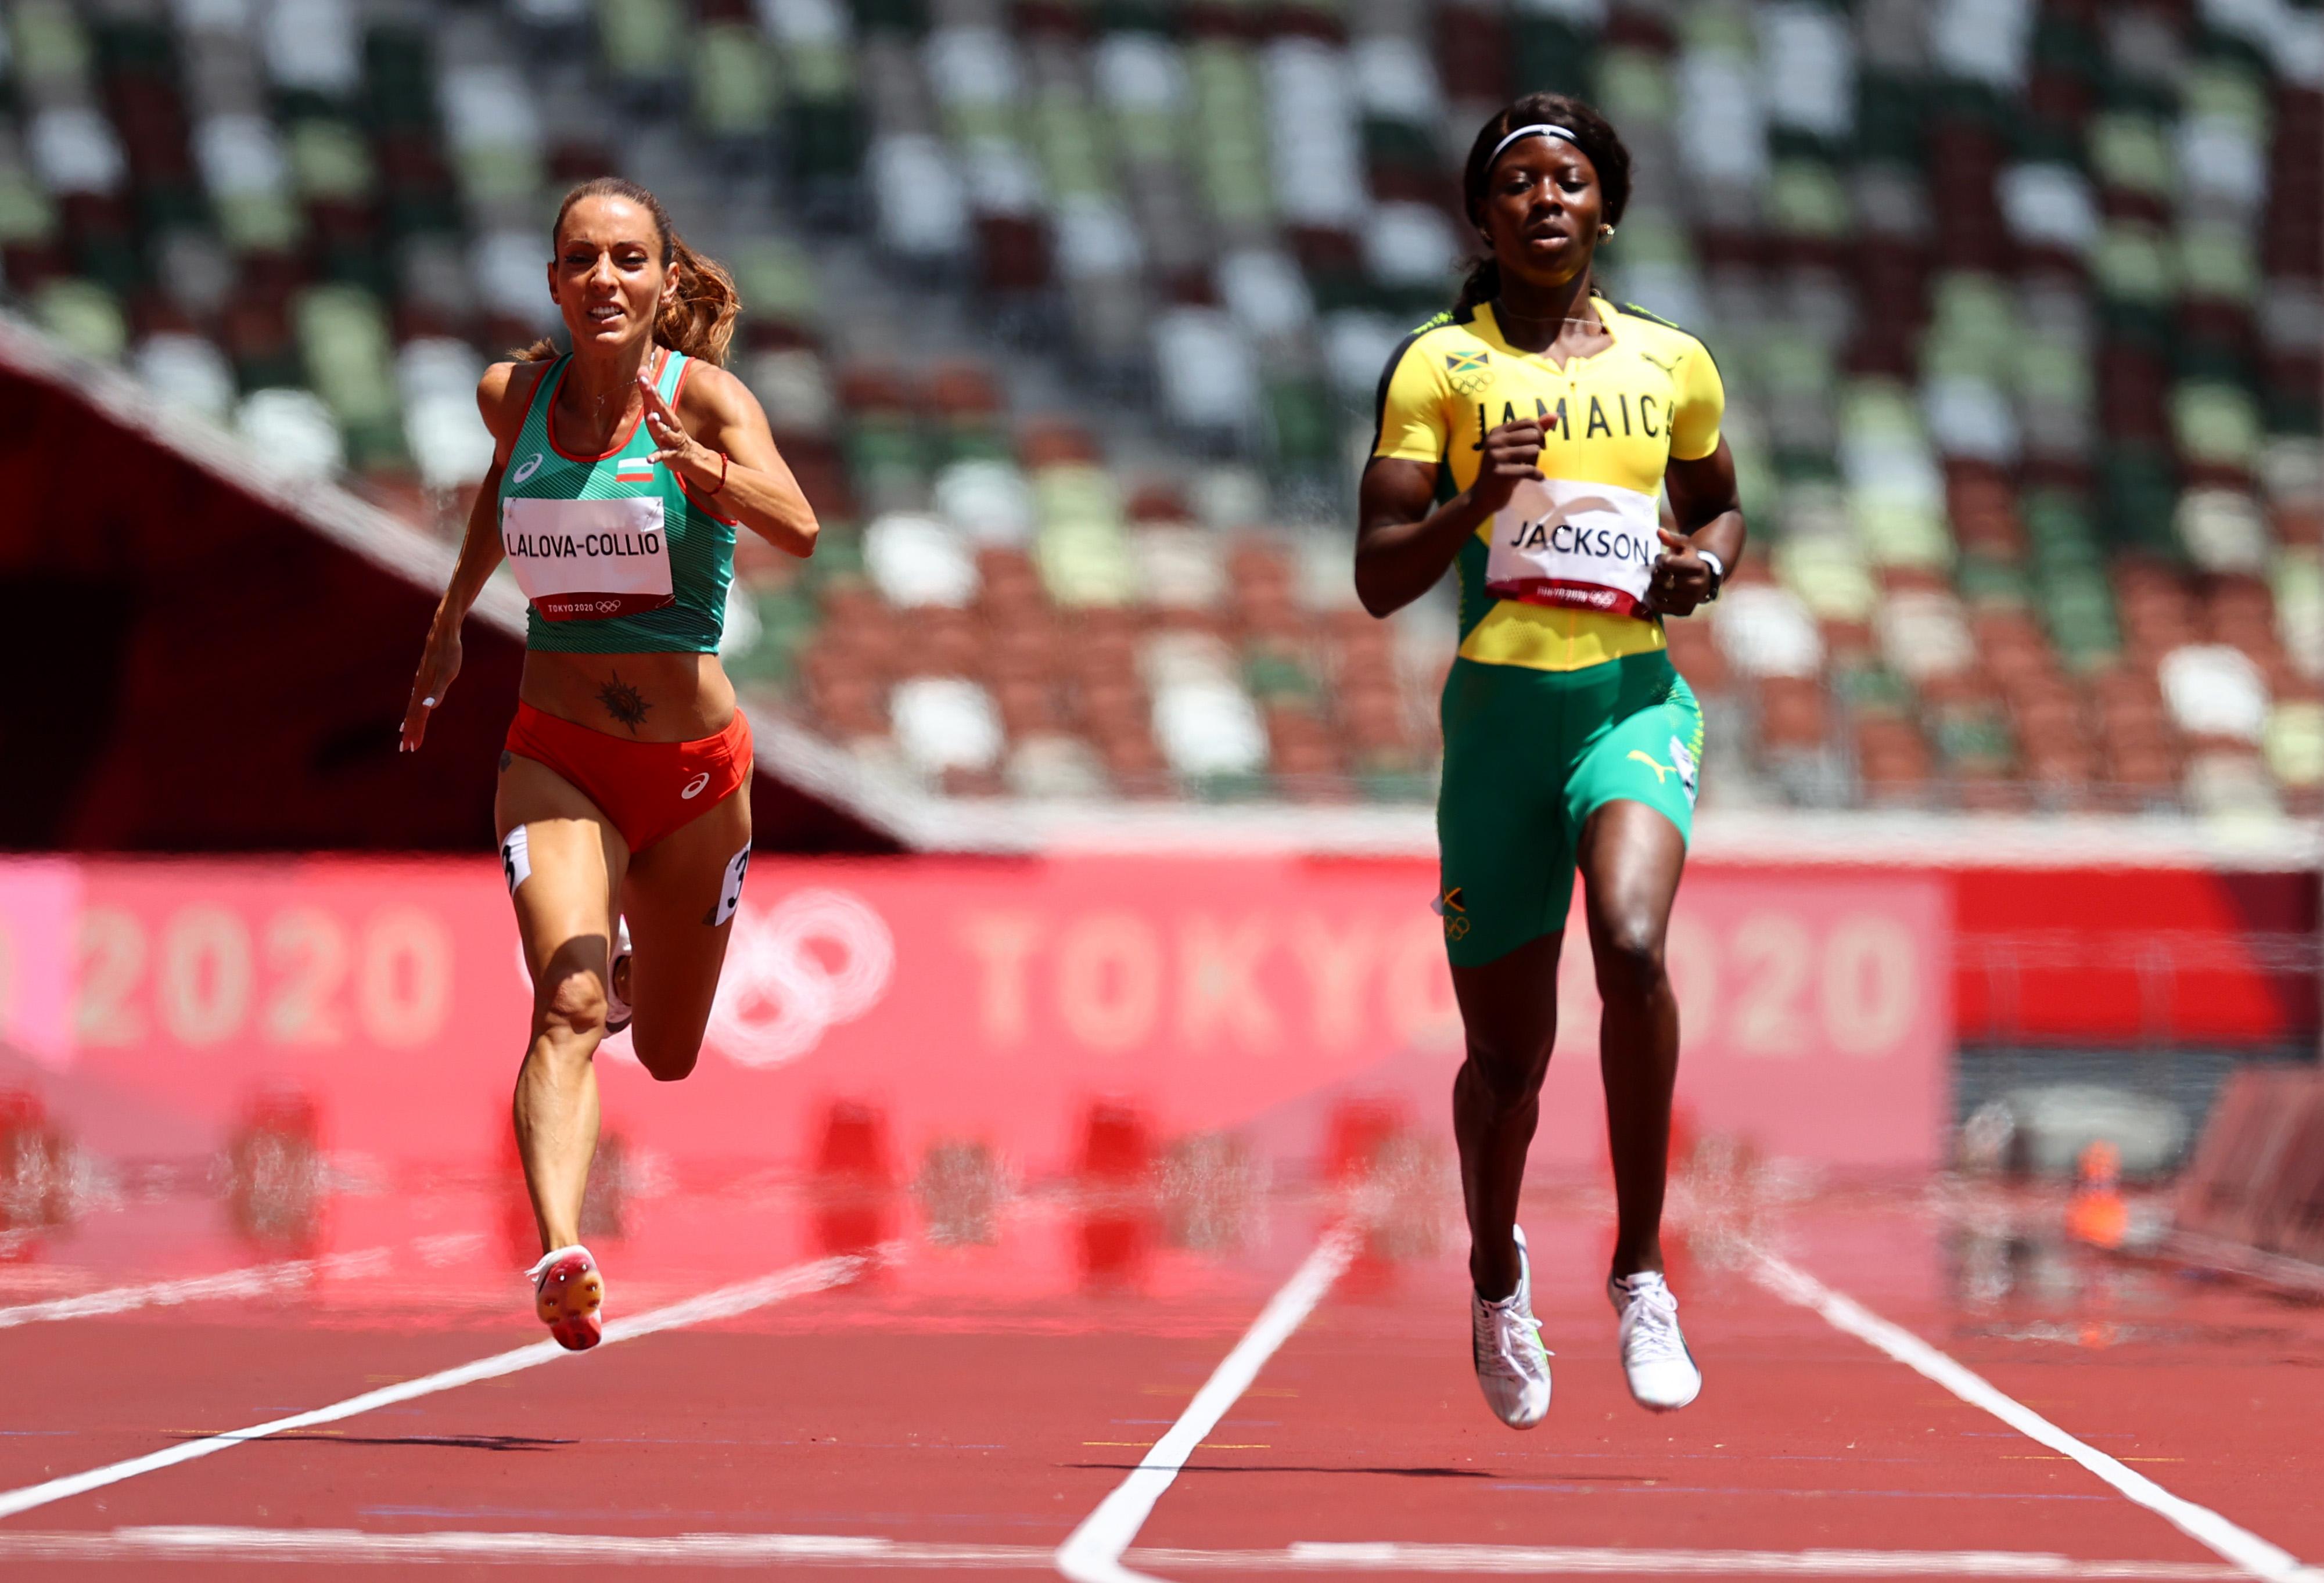 Tokyo 2020 Olympics - Athletics - Women's 200m - Round 1 - Olympic Stadium, Tokyo, Japan - August 2, 2021. Ivet Lalova-Collio of Bulgaria and Shericka Jackson of Jamaica in action REUTERS/Lucy Nicholson